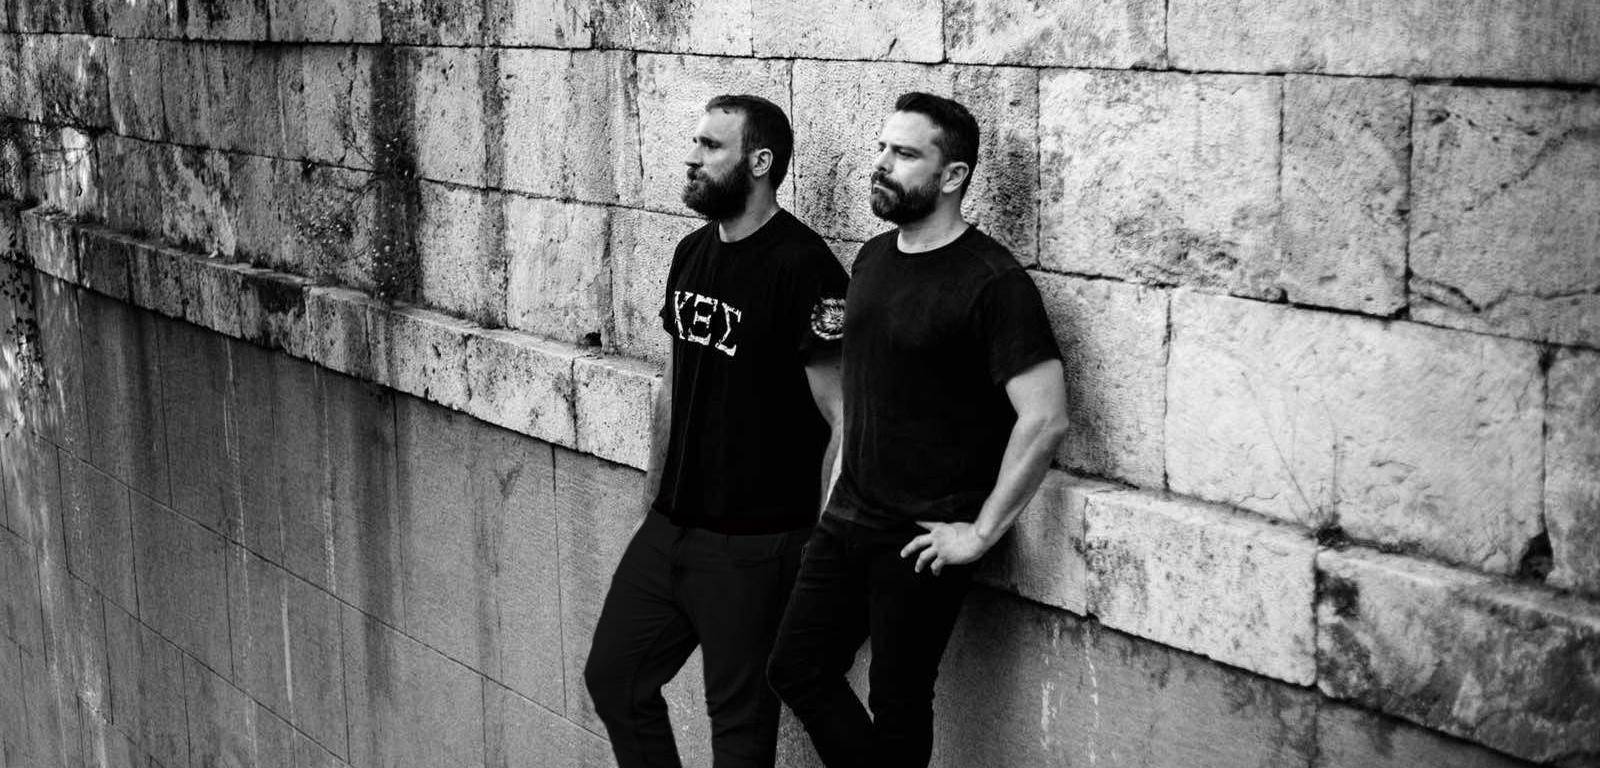 ELDINGAR reveal new single and album pre-orders